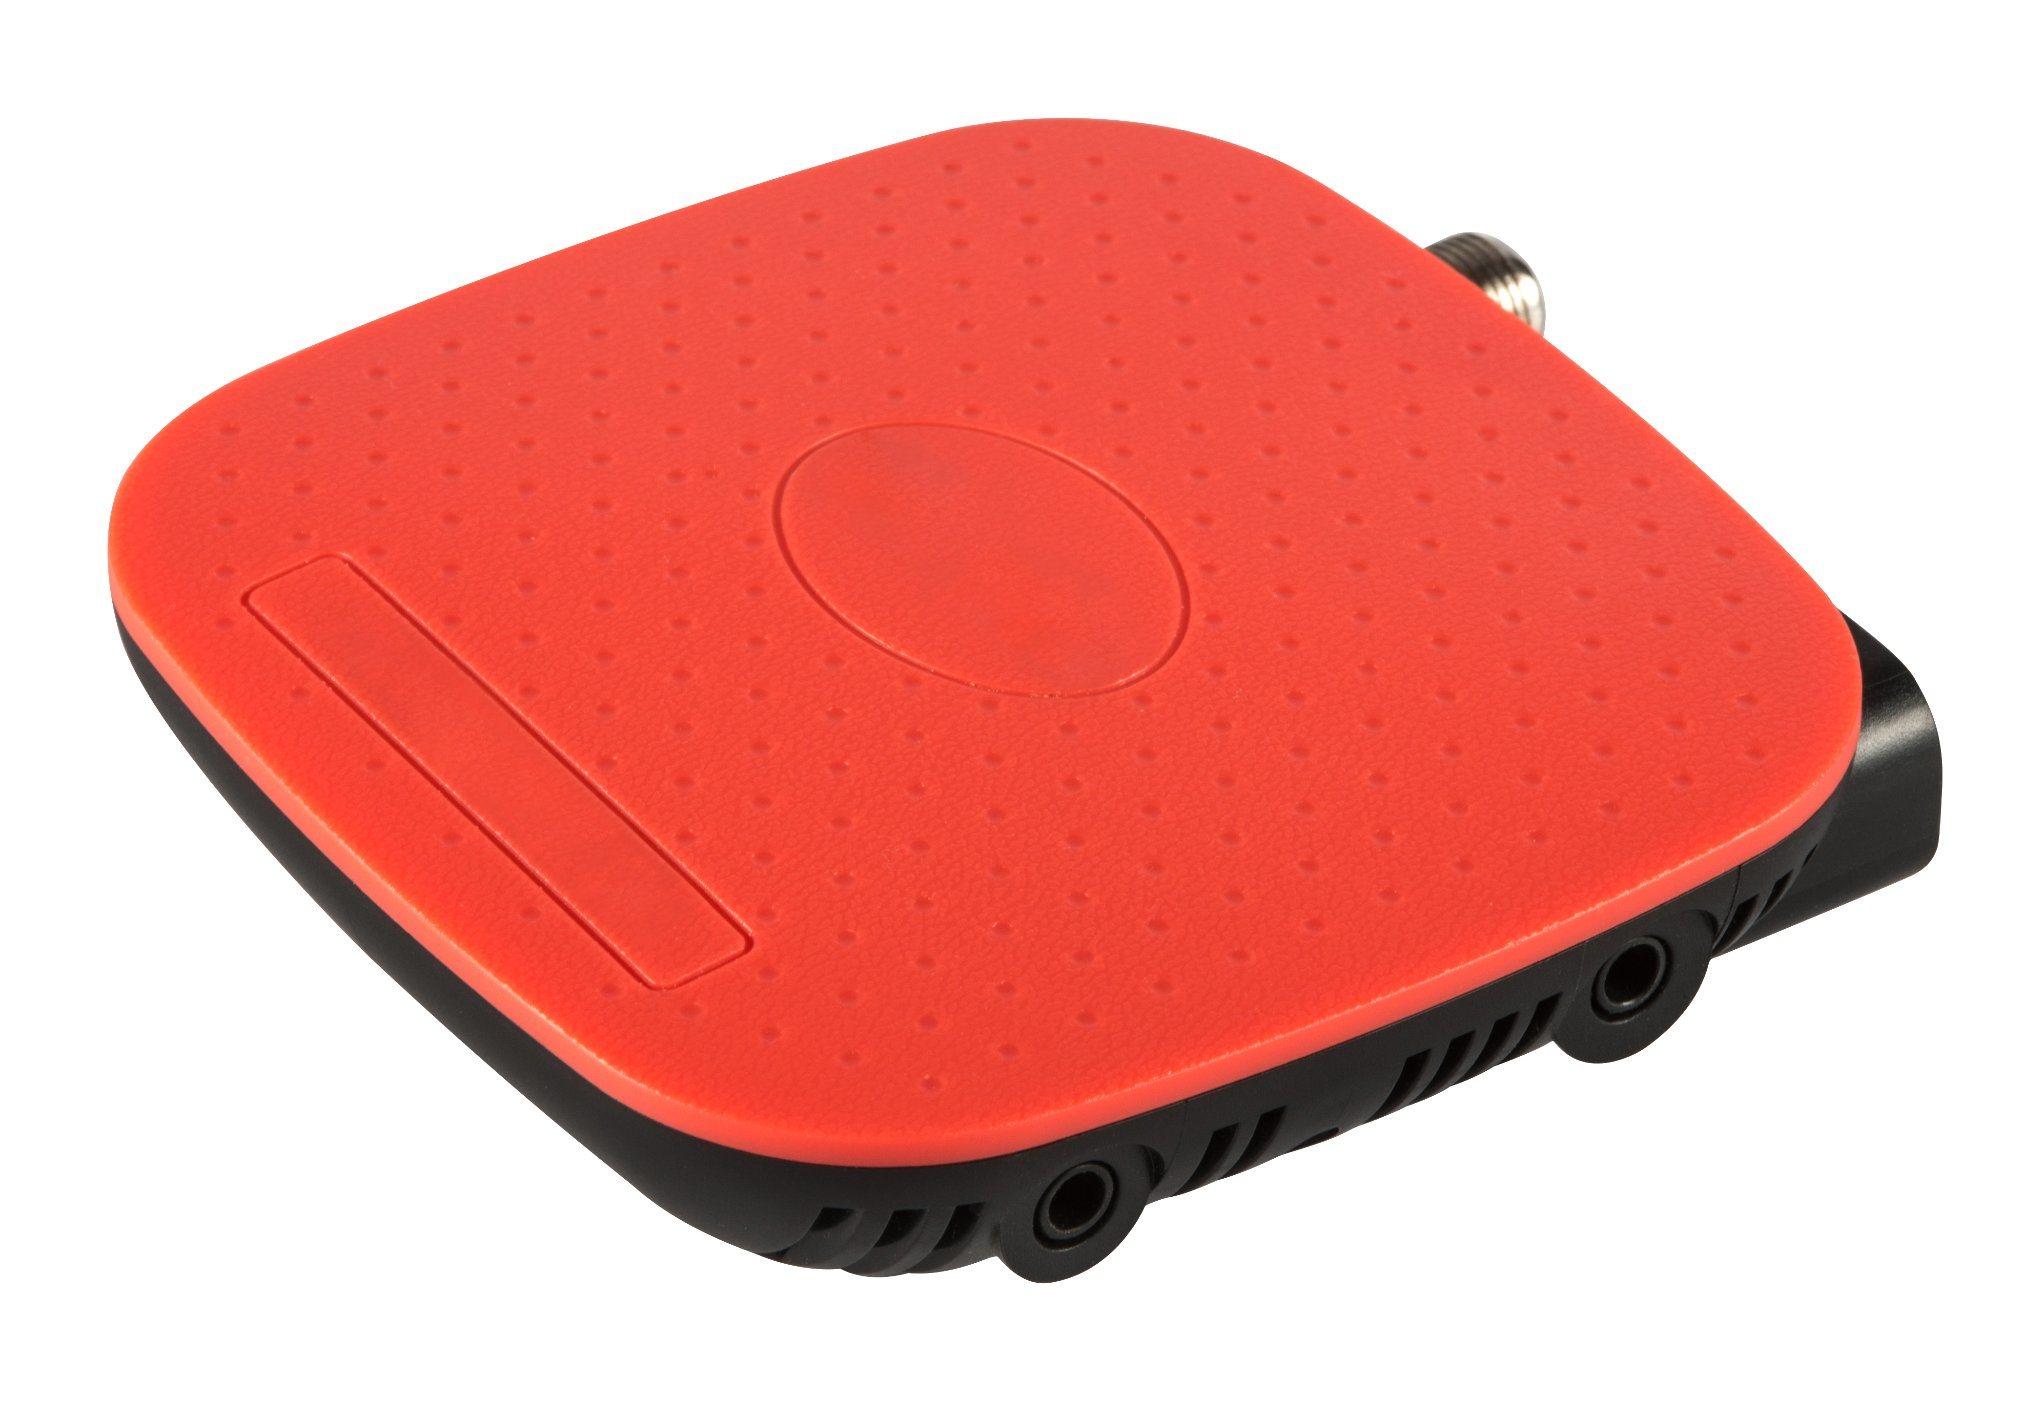 Cheper Price and High Quality HD FTA Mini DVB-S2 Receiver